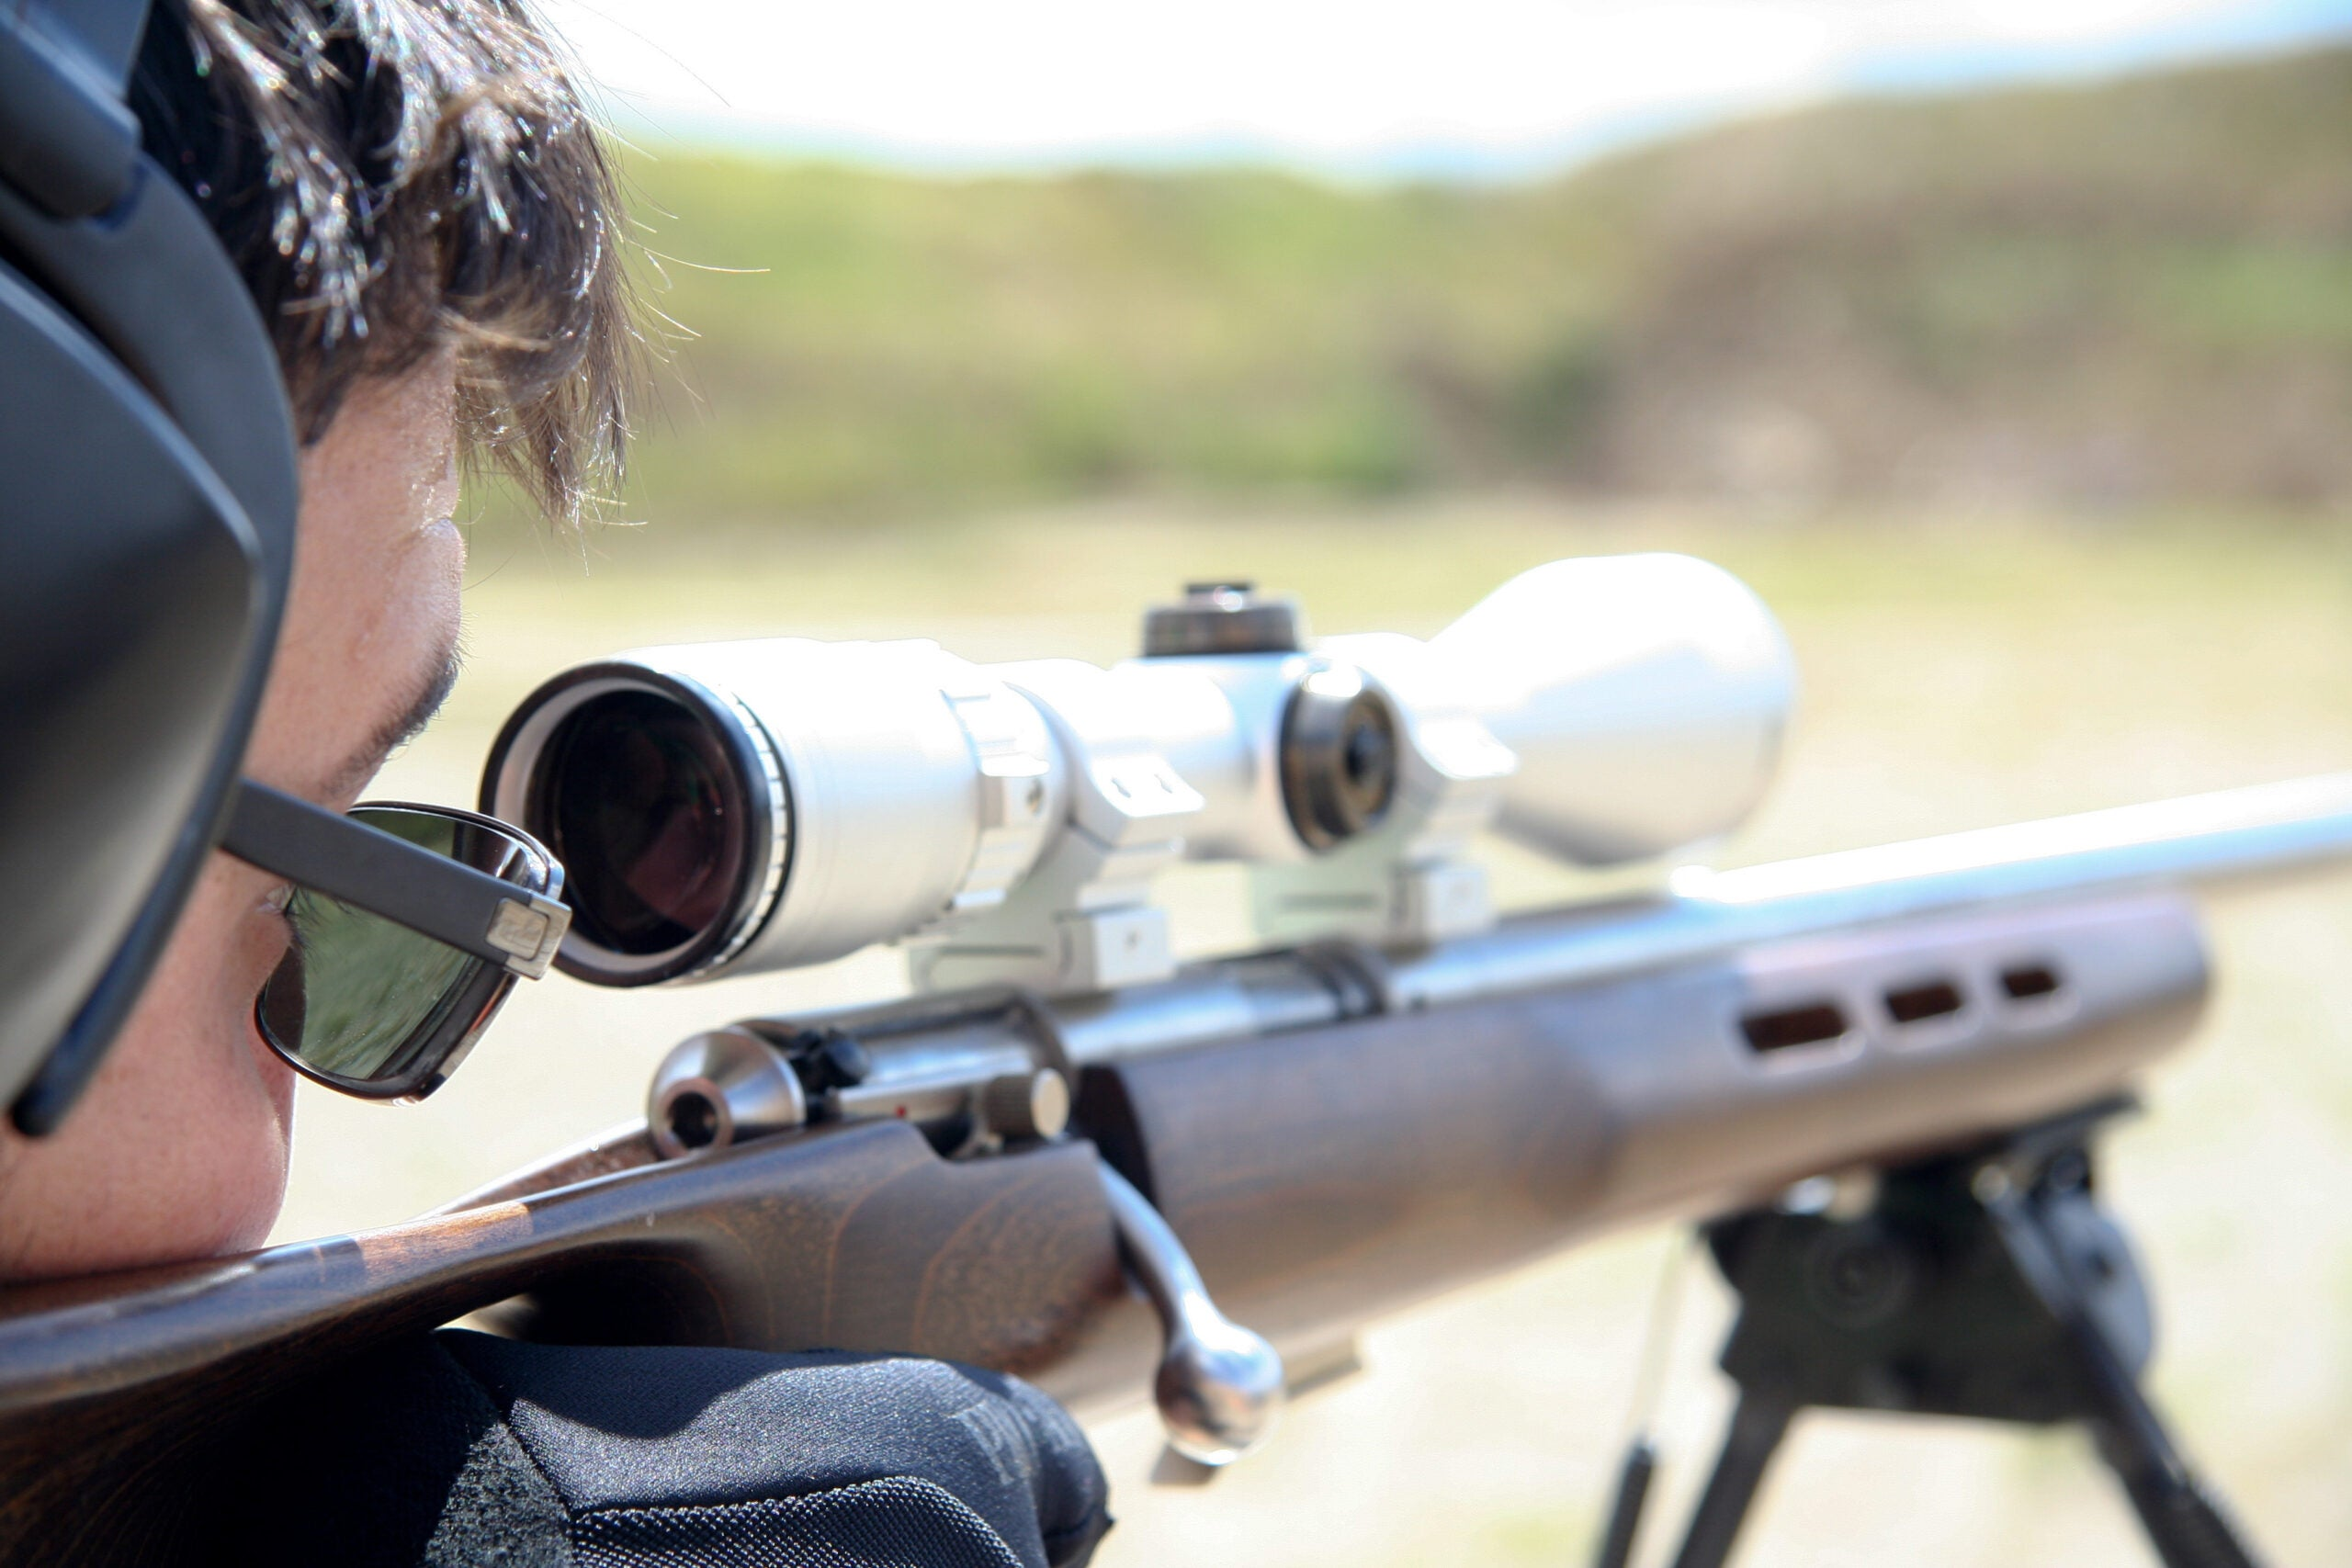 aiming riflescope